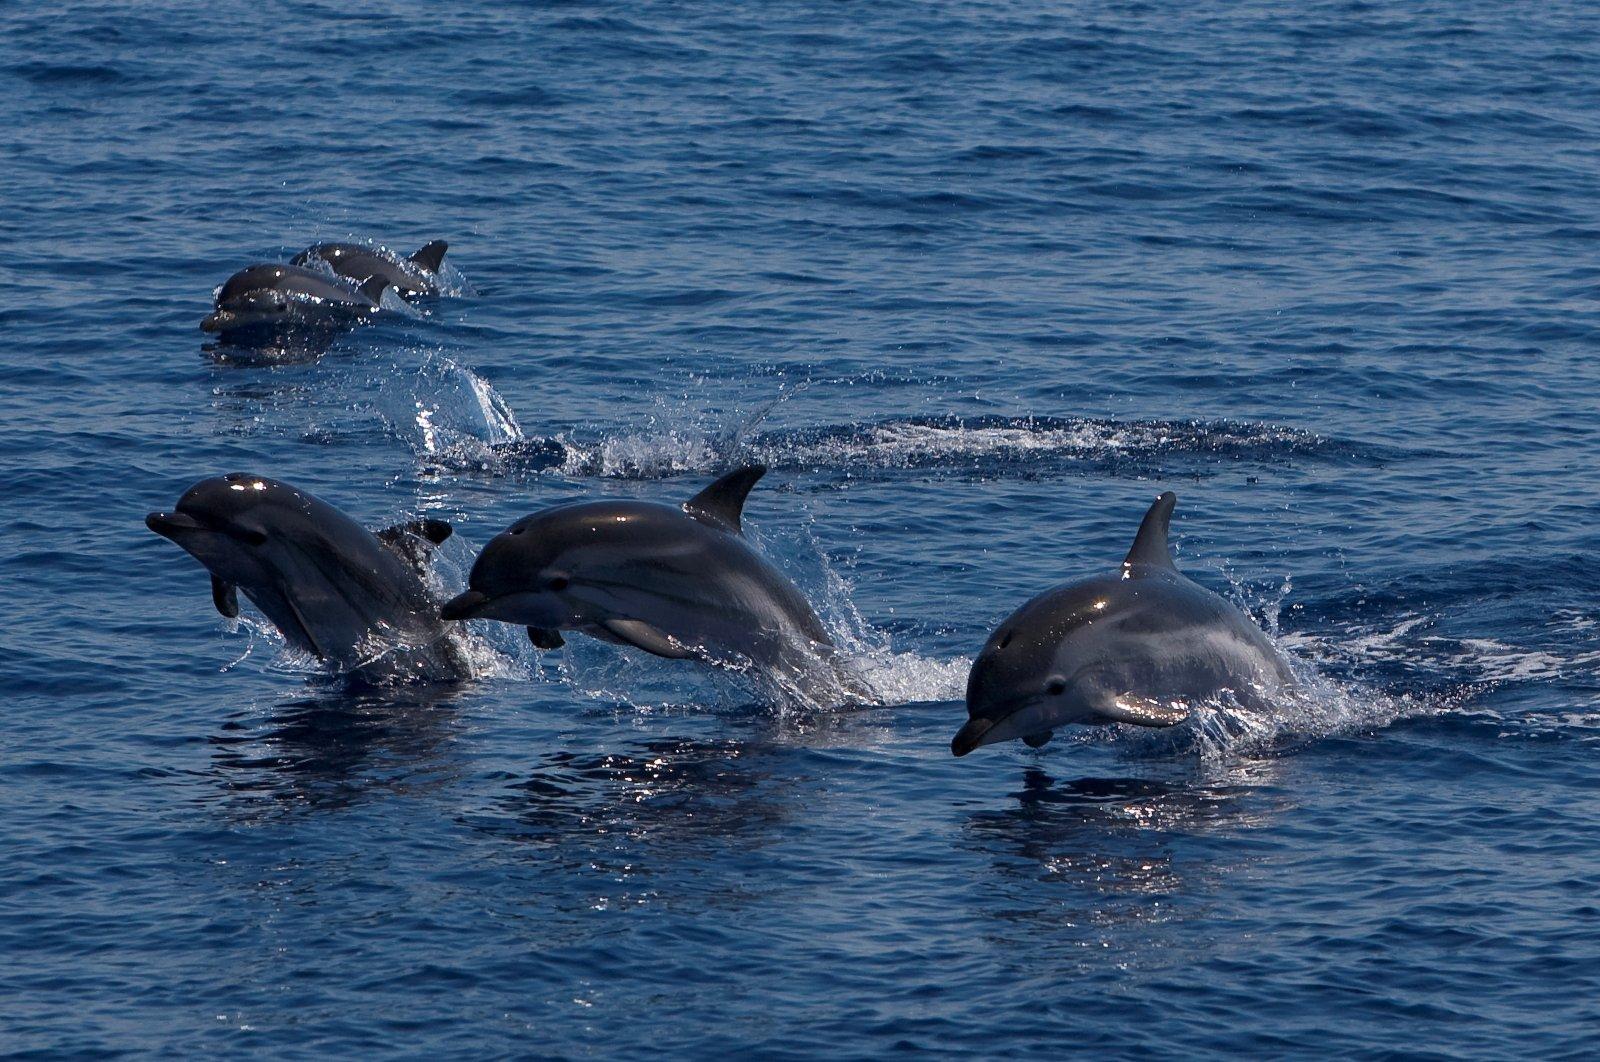 A group of dolphins swim near Capraia island in the Tyrrhenian Sea, Tuscany, Italy. (Getty Images)